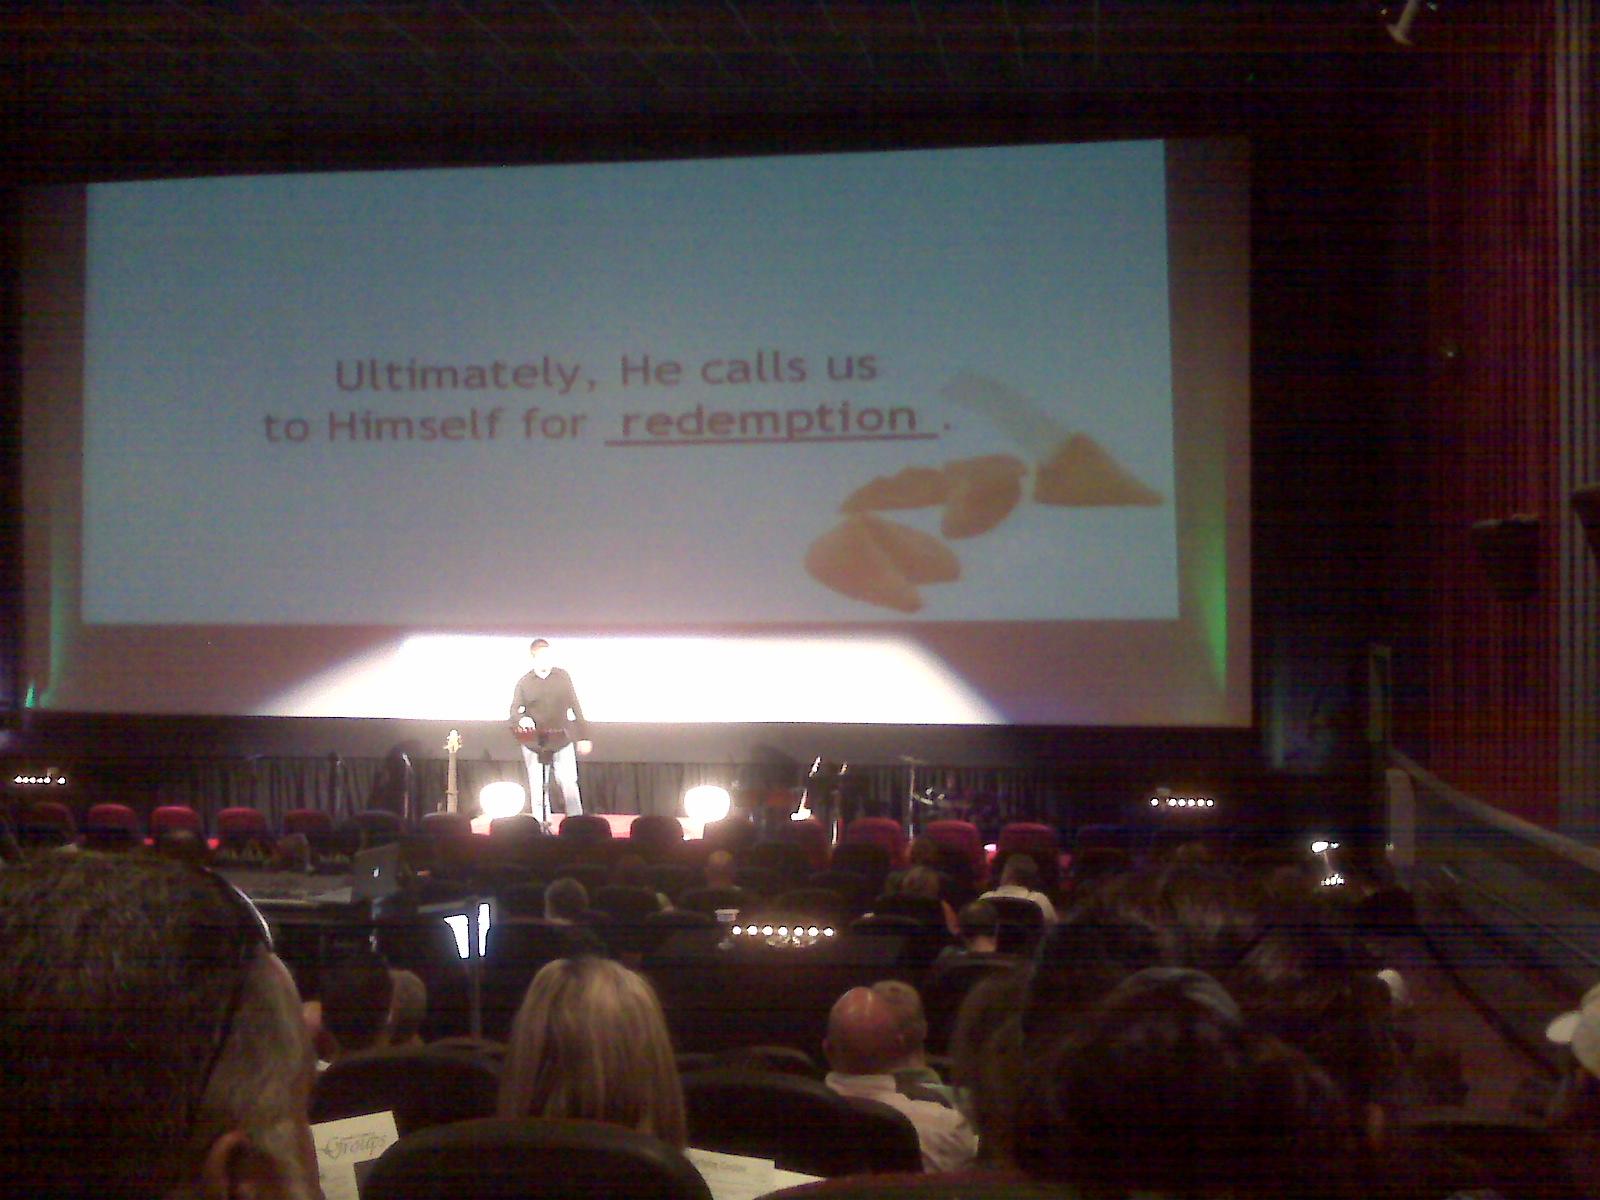 30 speaking on faith and destiny.